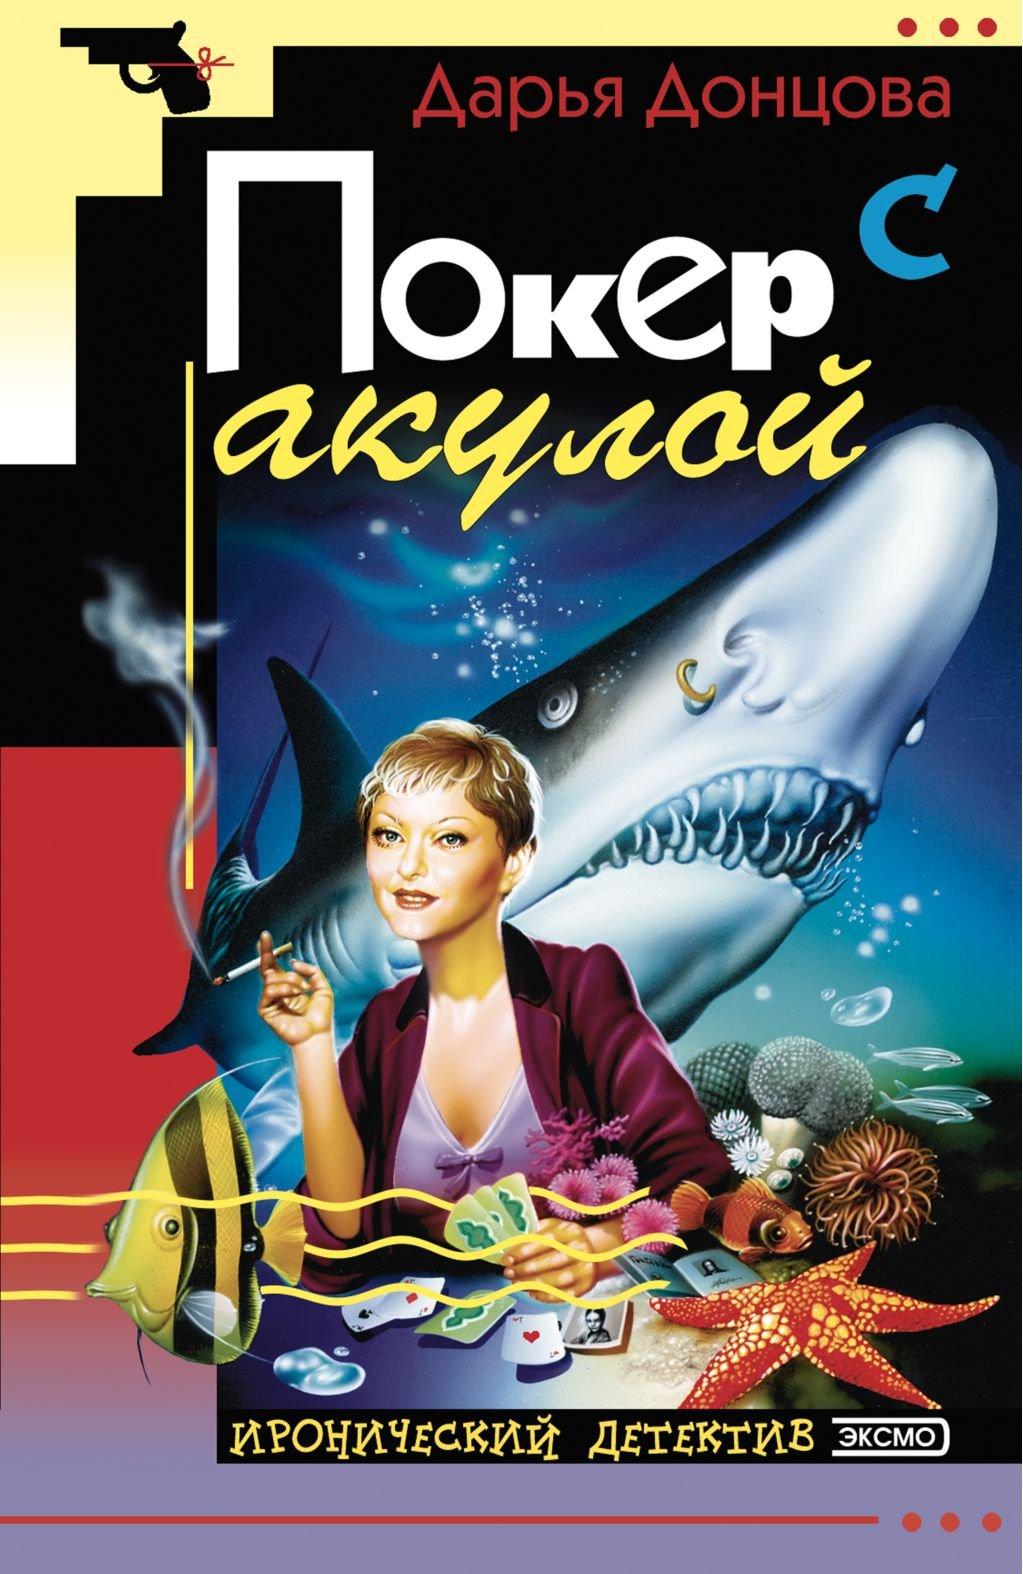 Download Poker s akuloj: Evlampija Romanova. Sledstvie vedet diletant #2 (Ironicheskiĭ detektiv) (Russian Edition) ebook